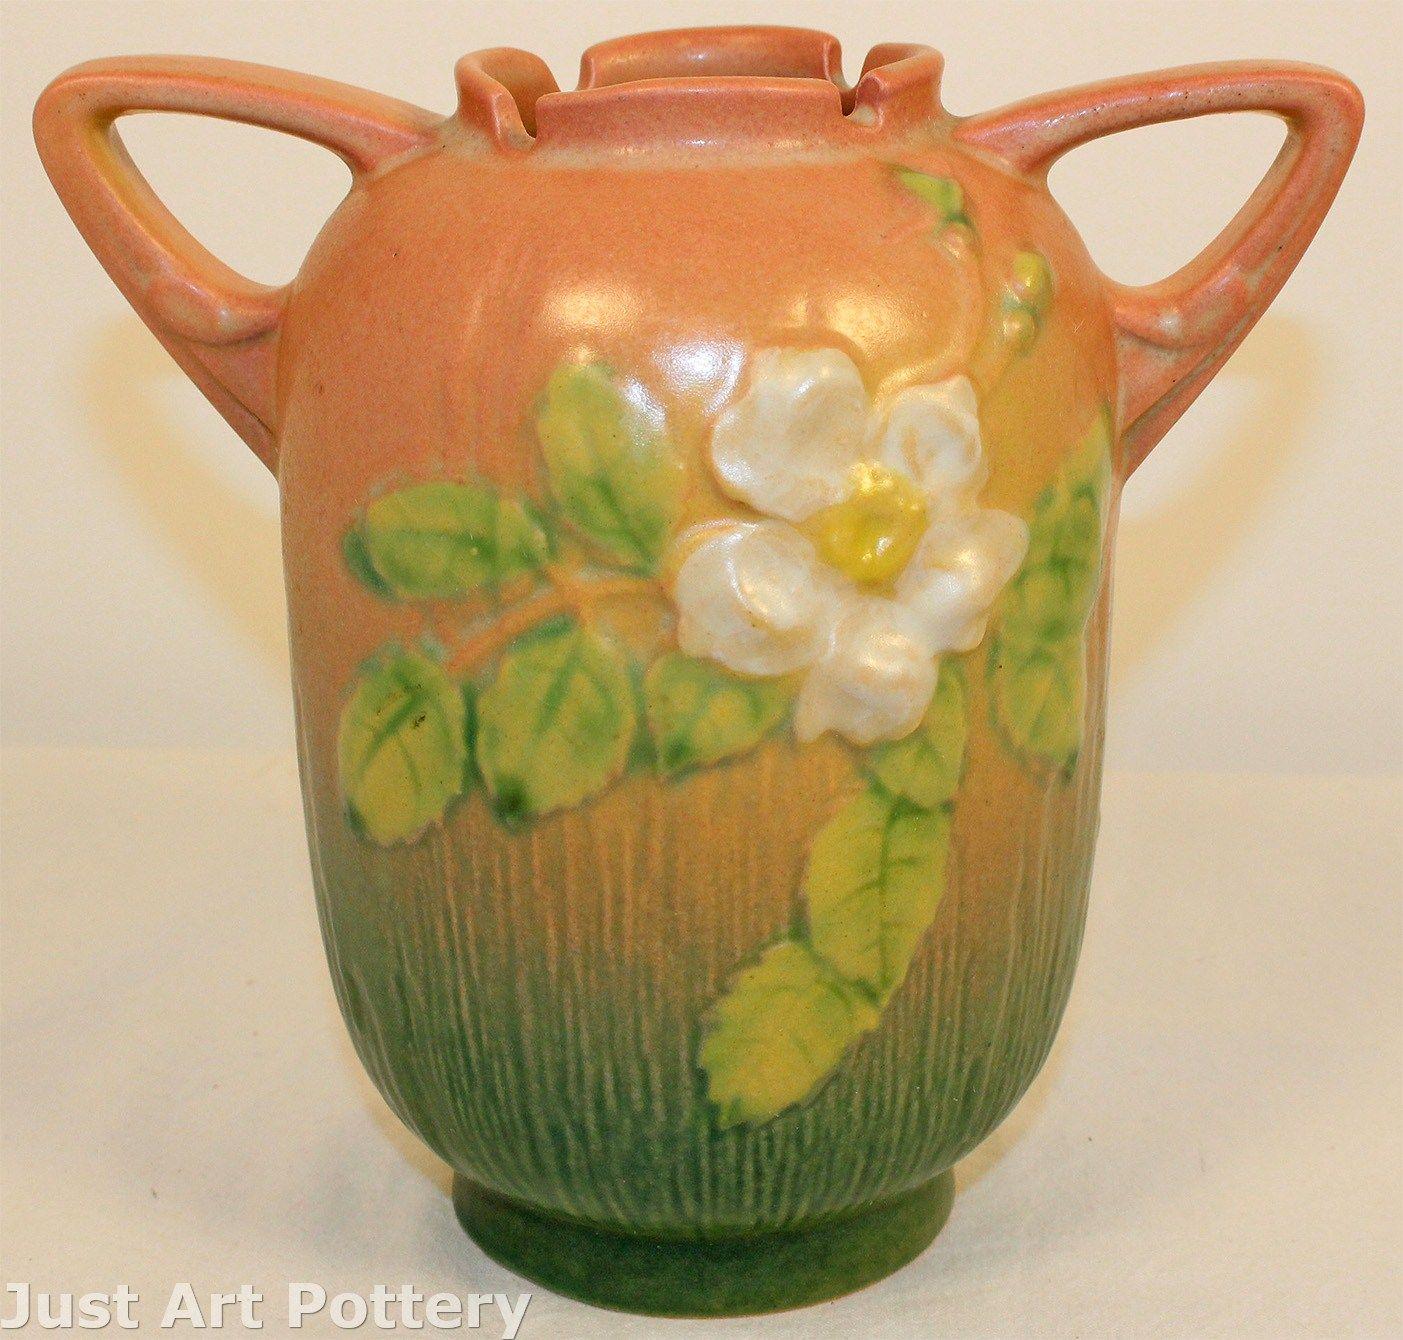 Roseville Pottery White Rose Pink Vase 979-6 from Just Art Pottery